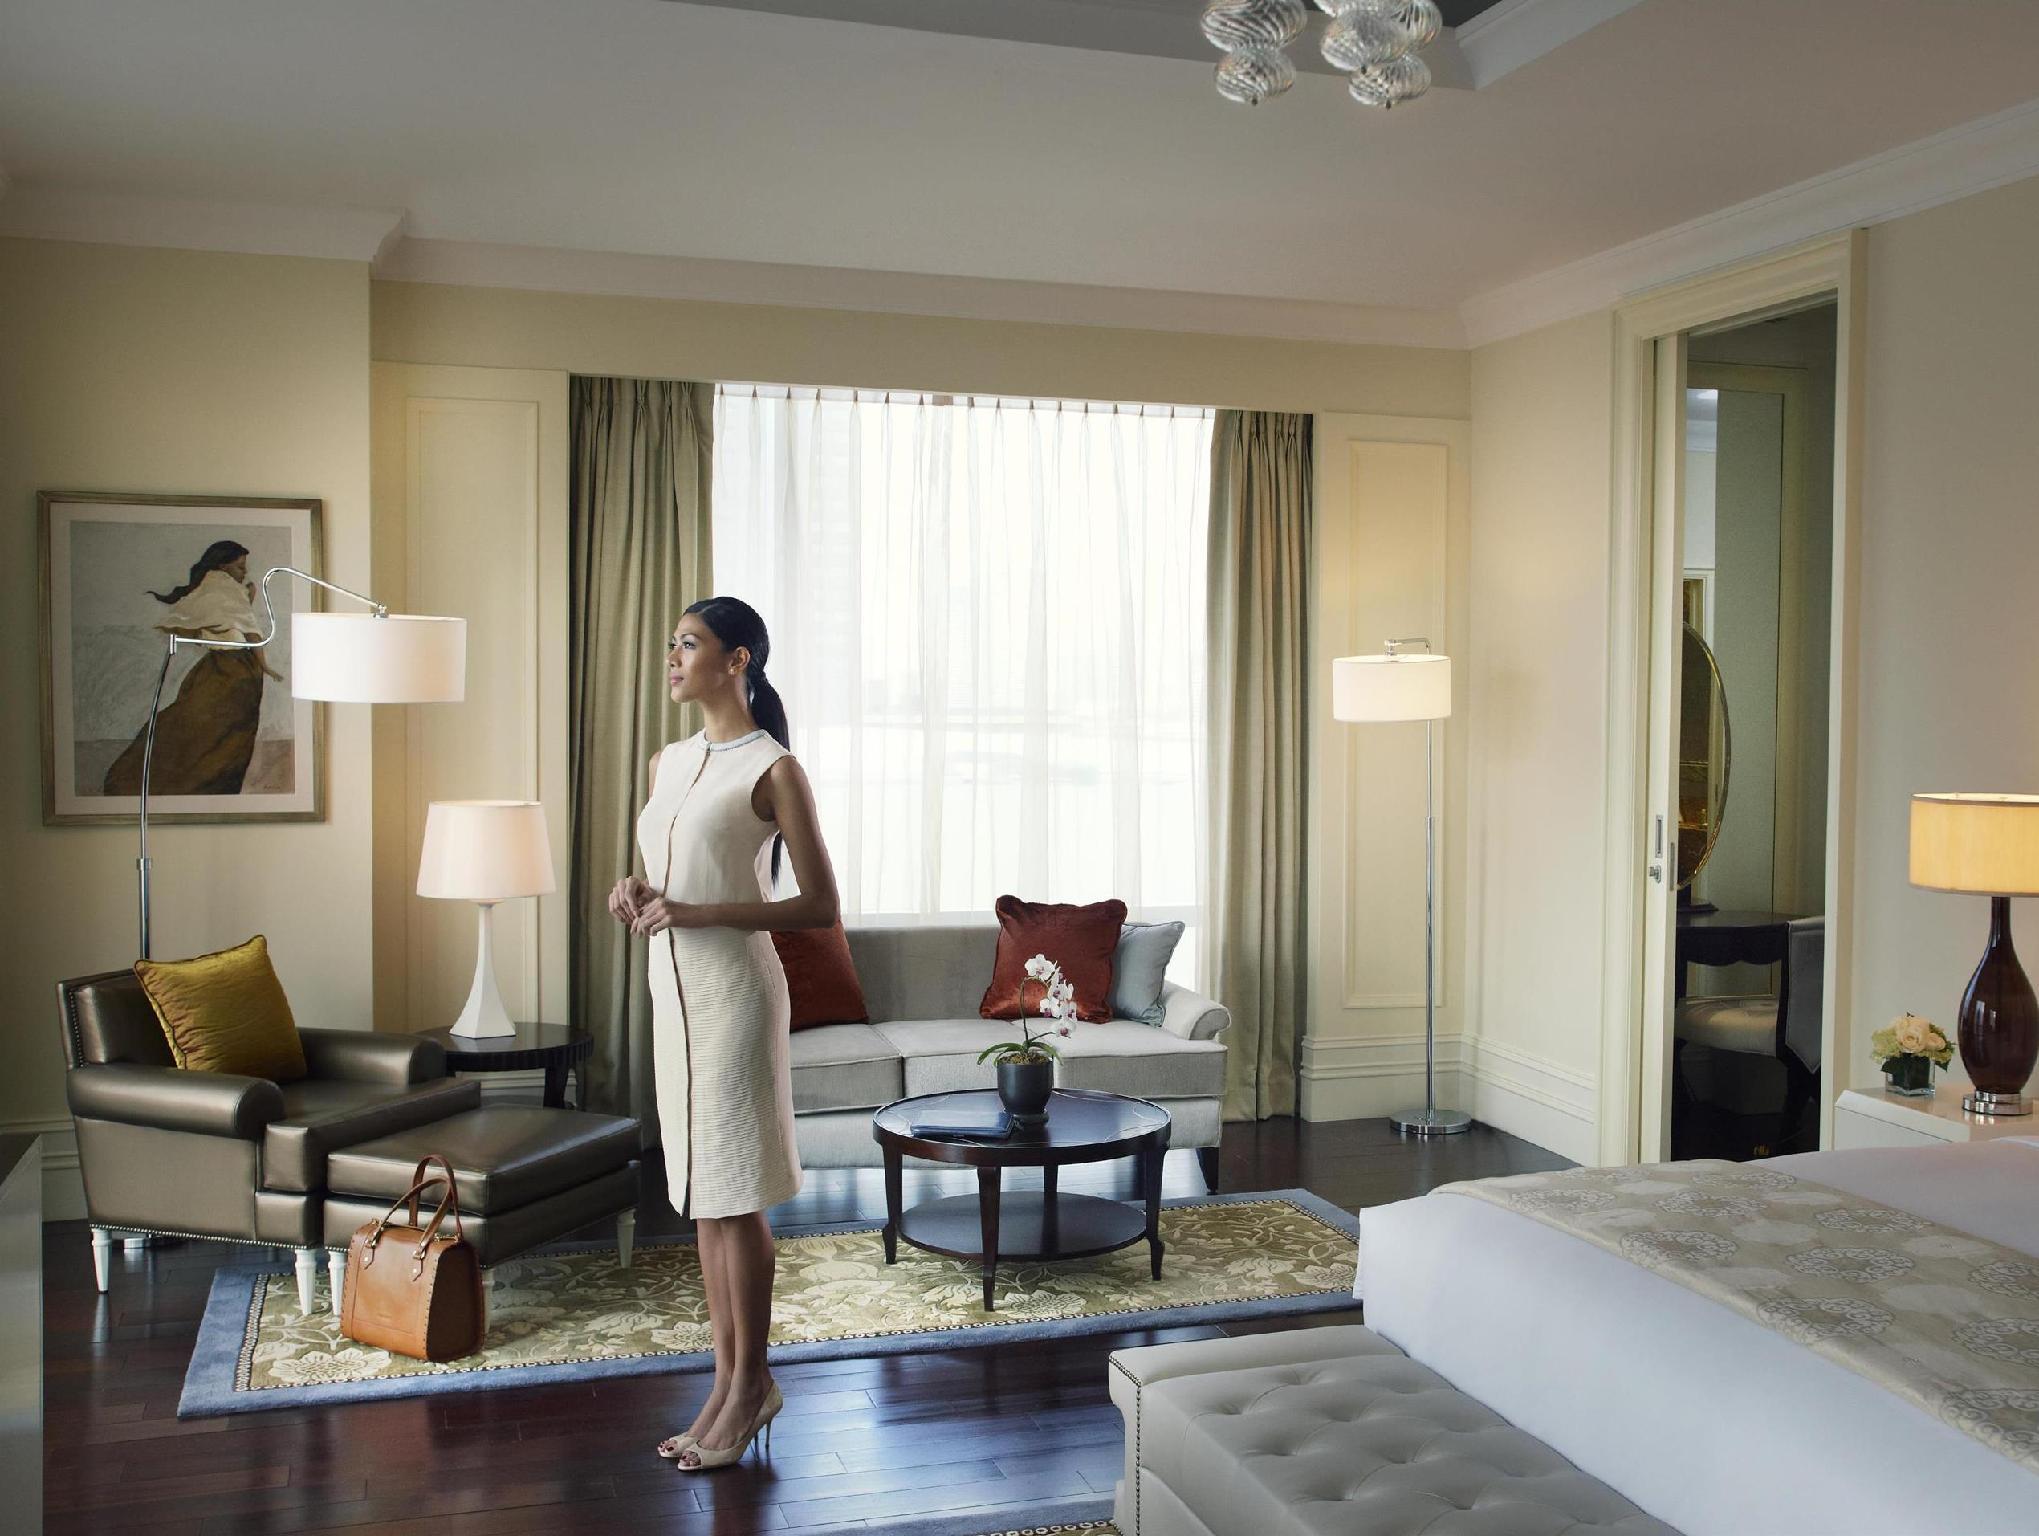 affordable sofa bed metro manila gary wilson sofascore raffles makati hotel in room deals photos and reviews